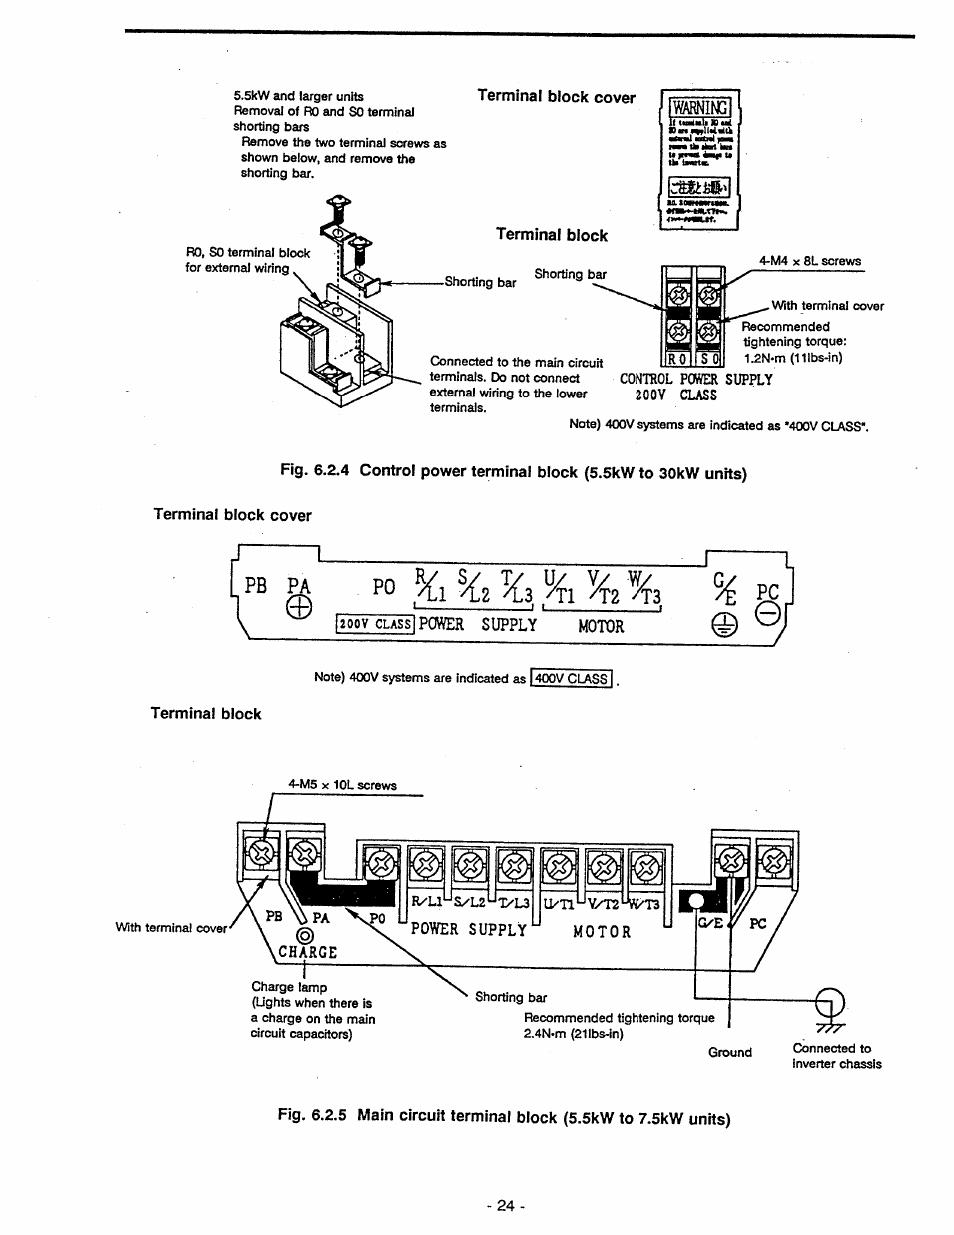 hight resolution of terminal block cover terminal block 200v class power supply motor pb